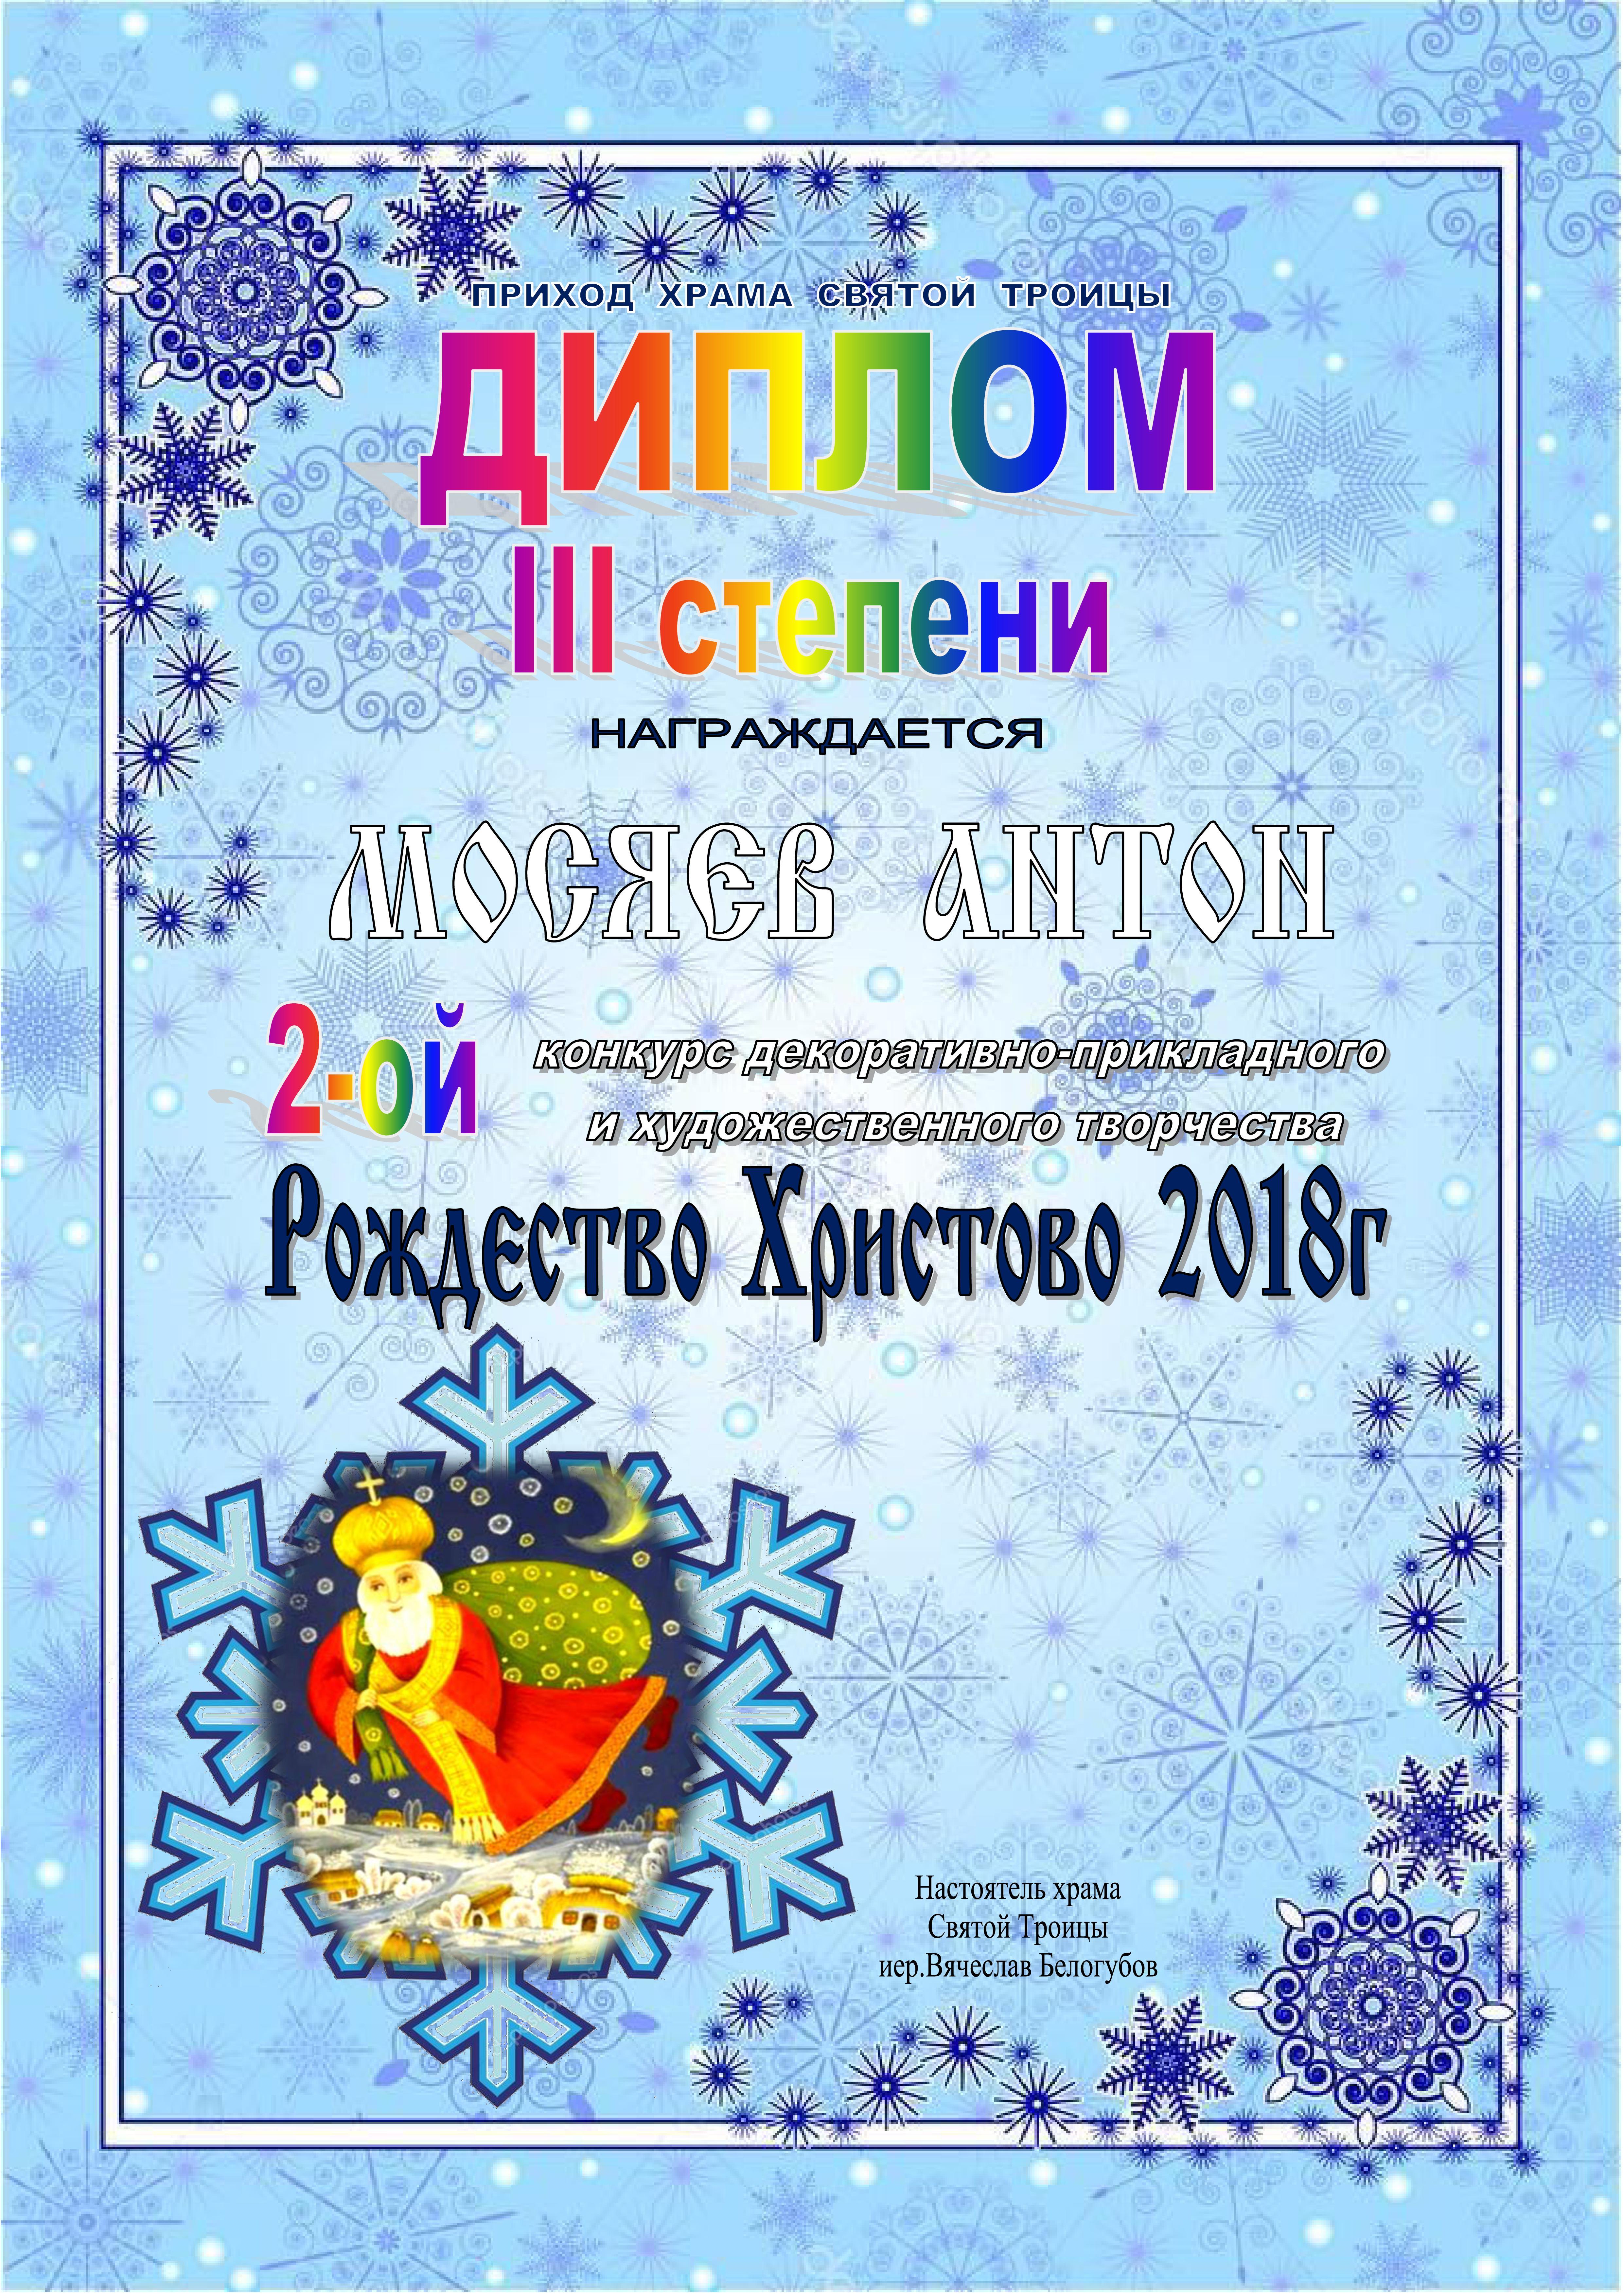 Мосяев Антон